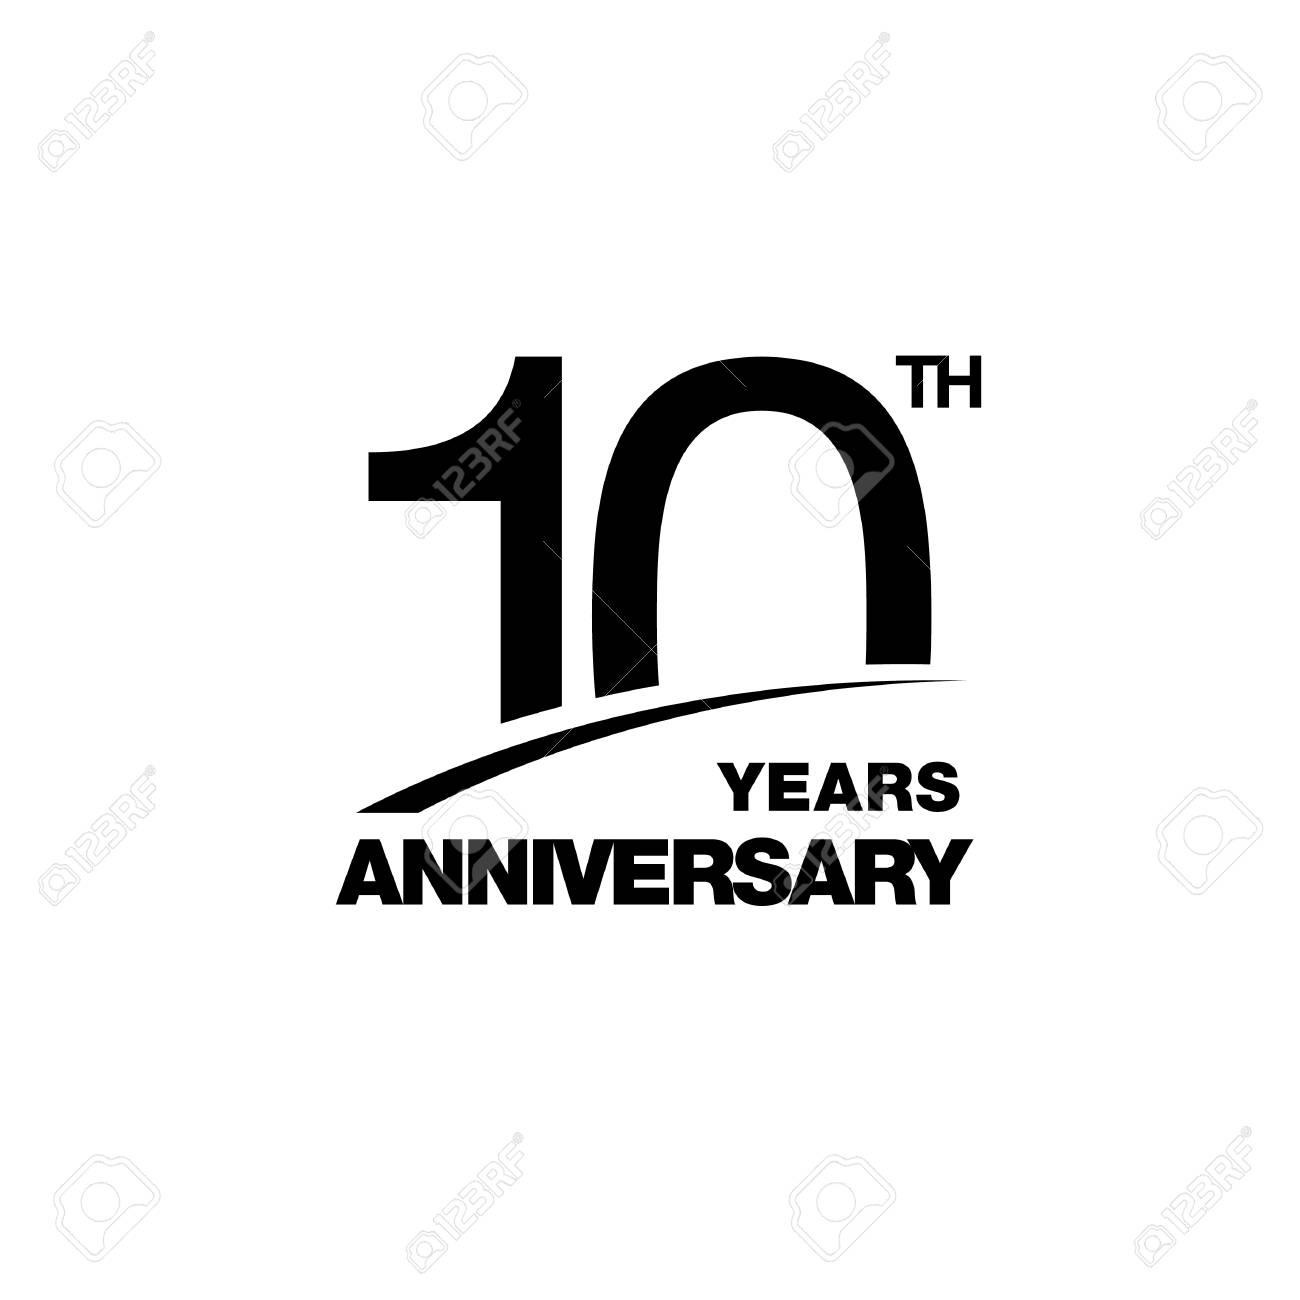 10th Anniversary Cliparts Free Download Clip Art.